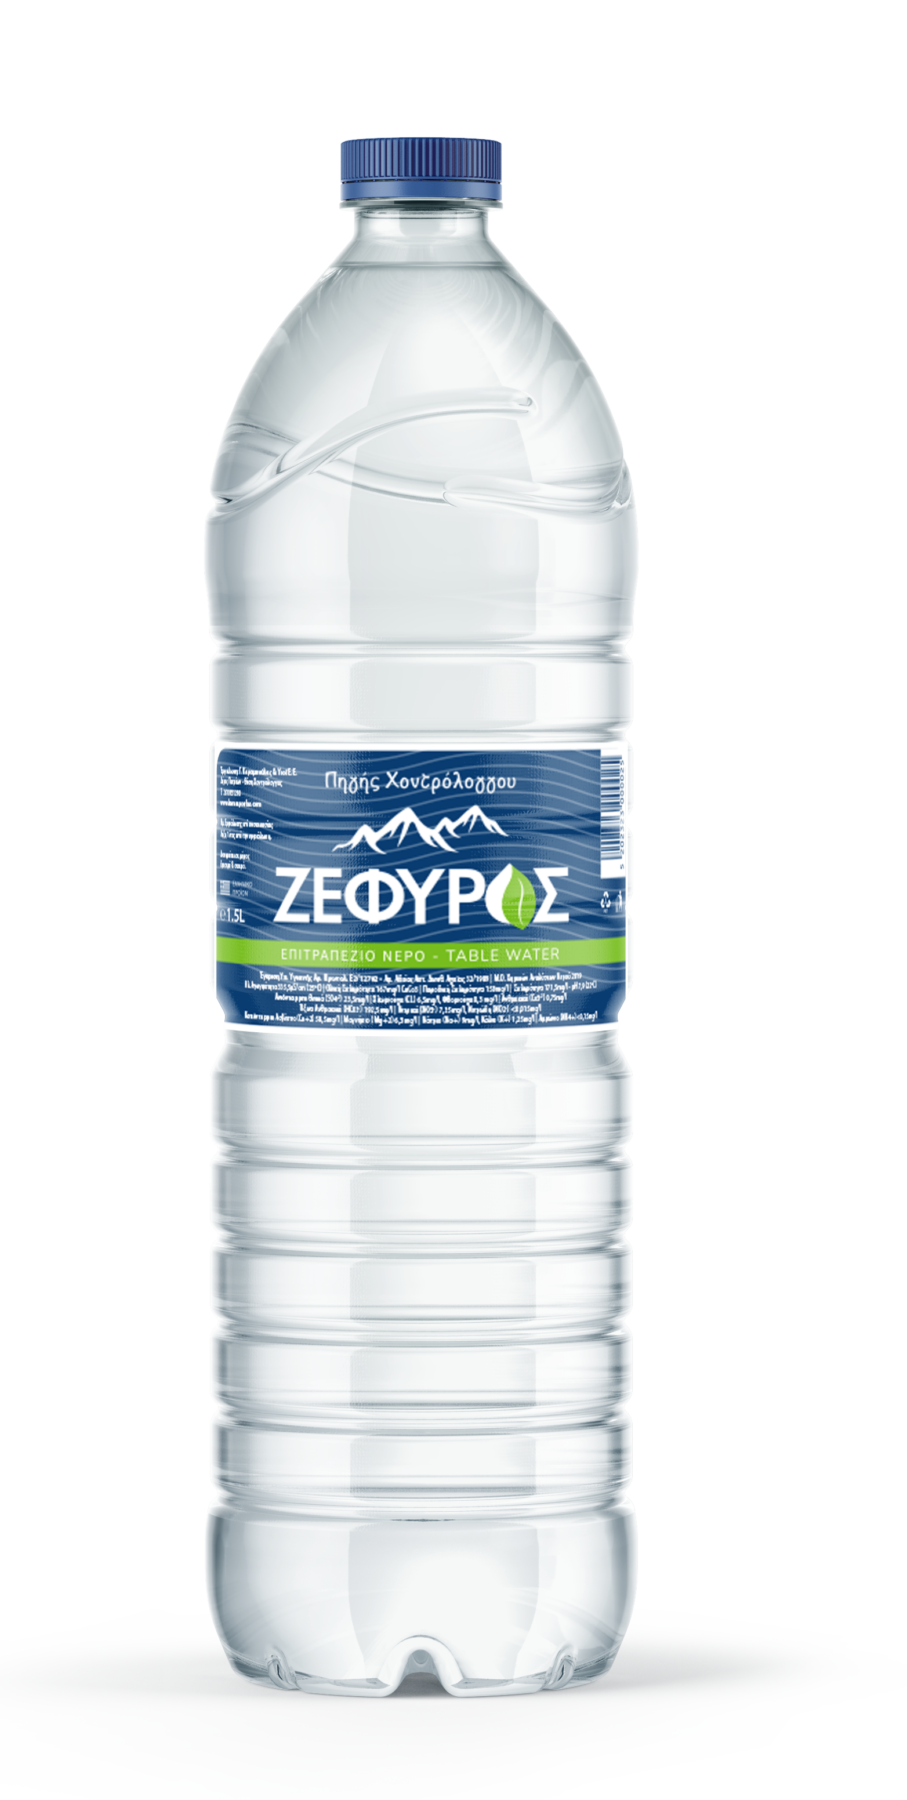 zefyros-water-karampoulas